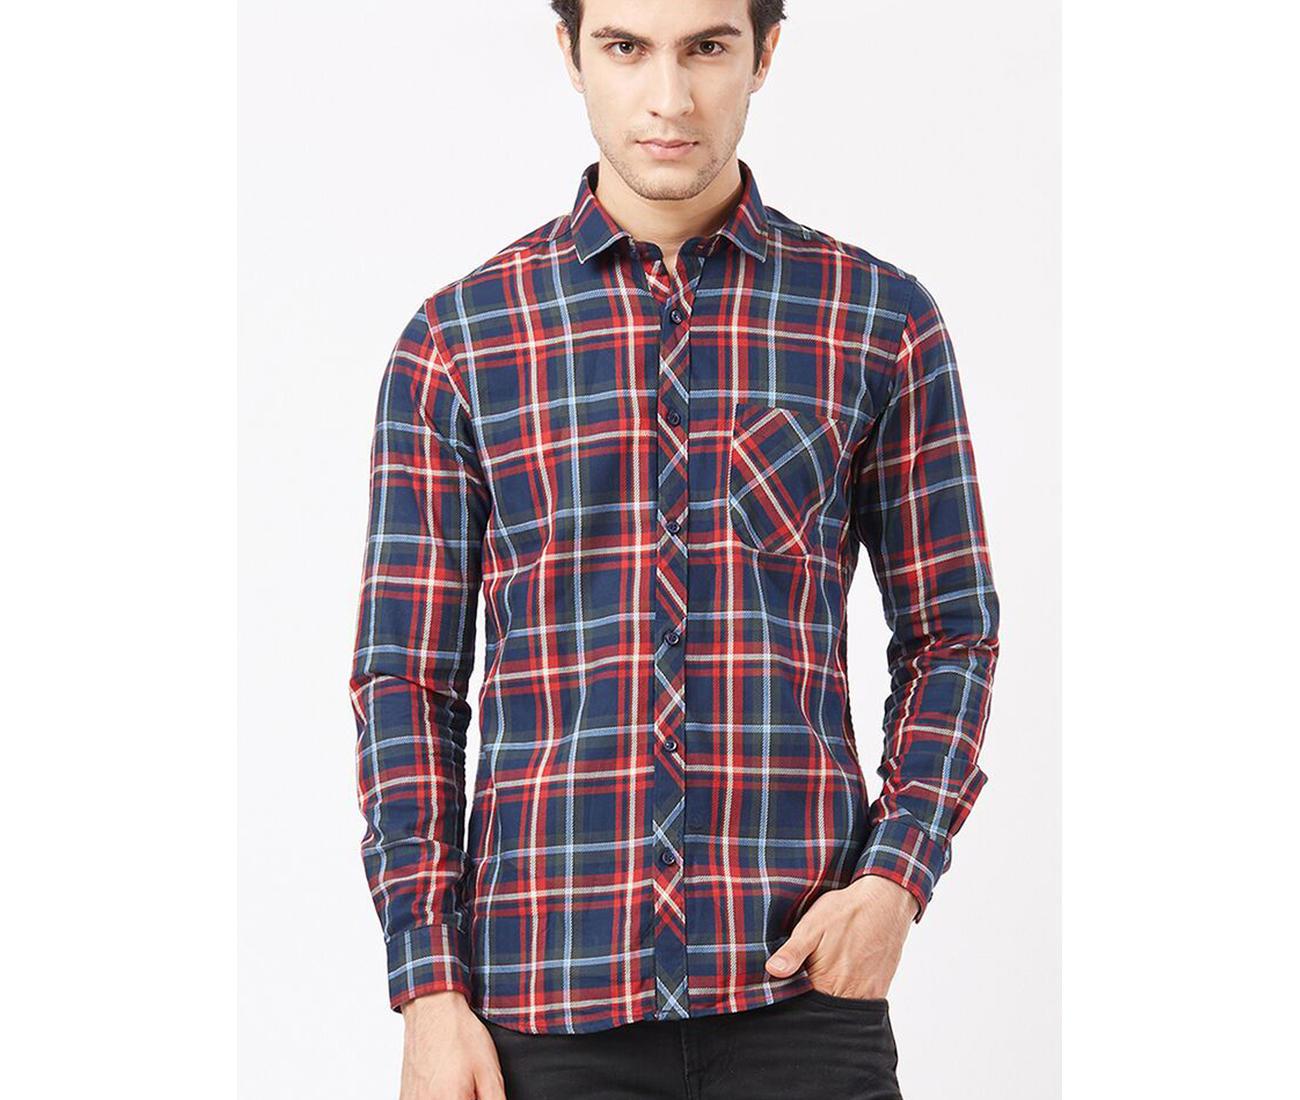 00e865c9ac7 Killer Shirts - Buy Red Checkered Shirts